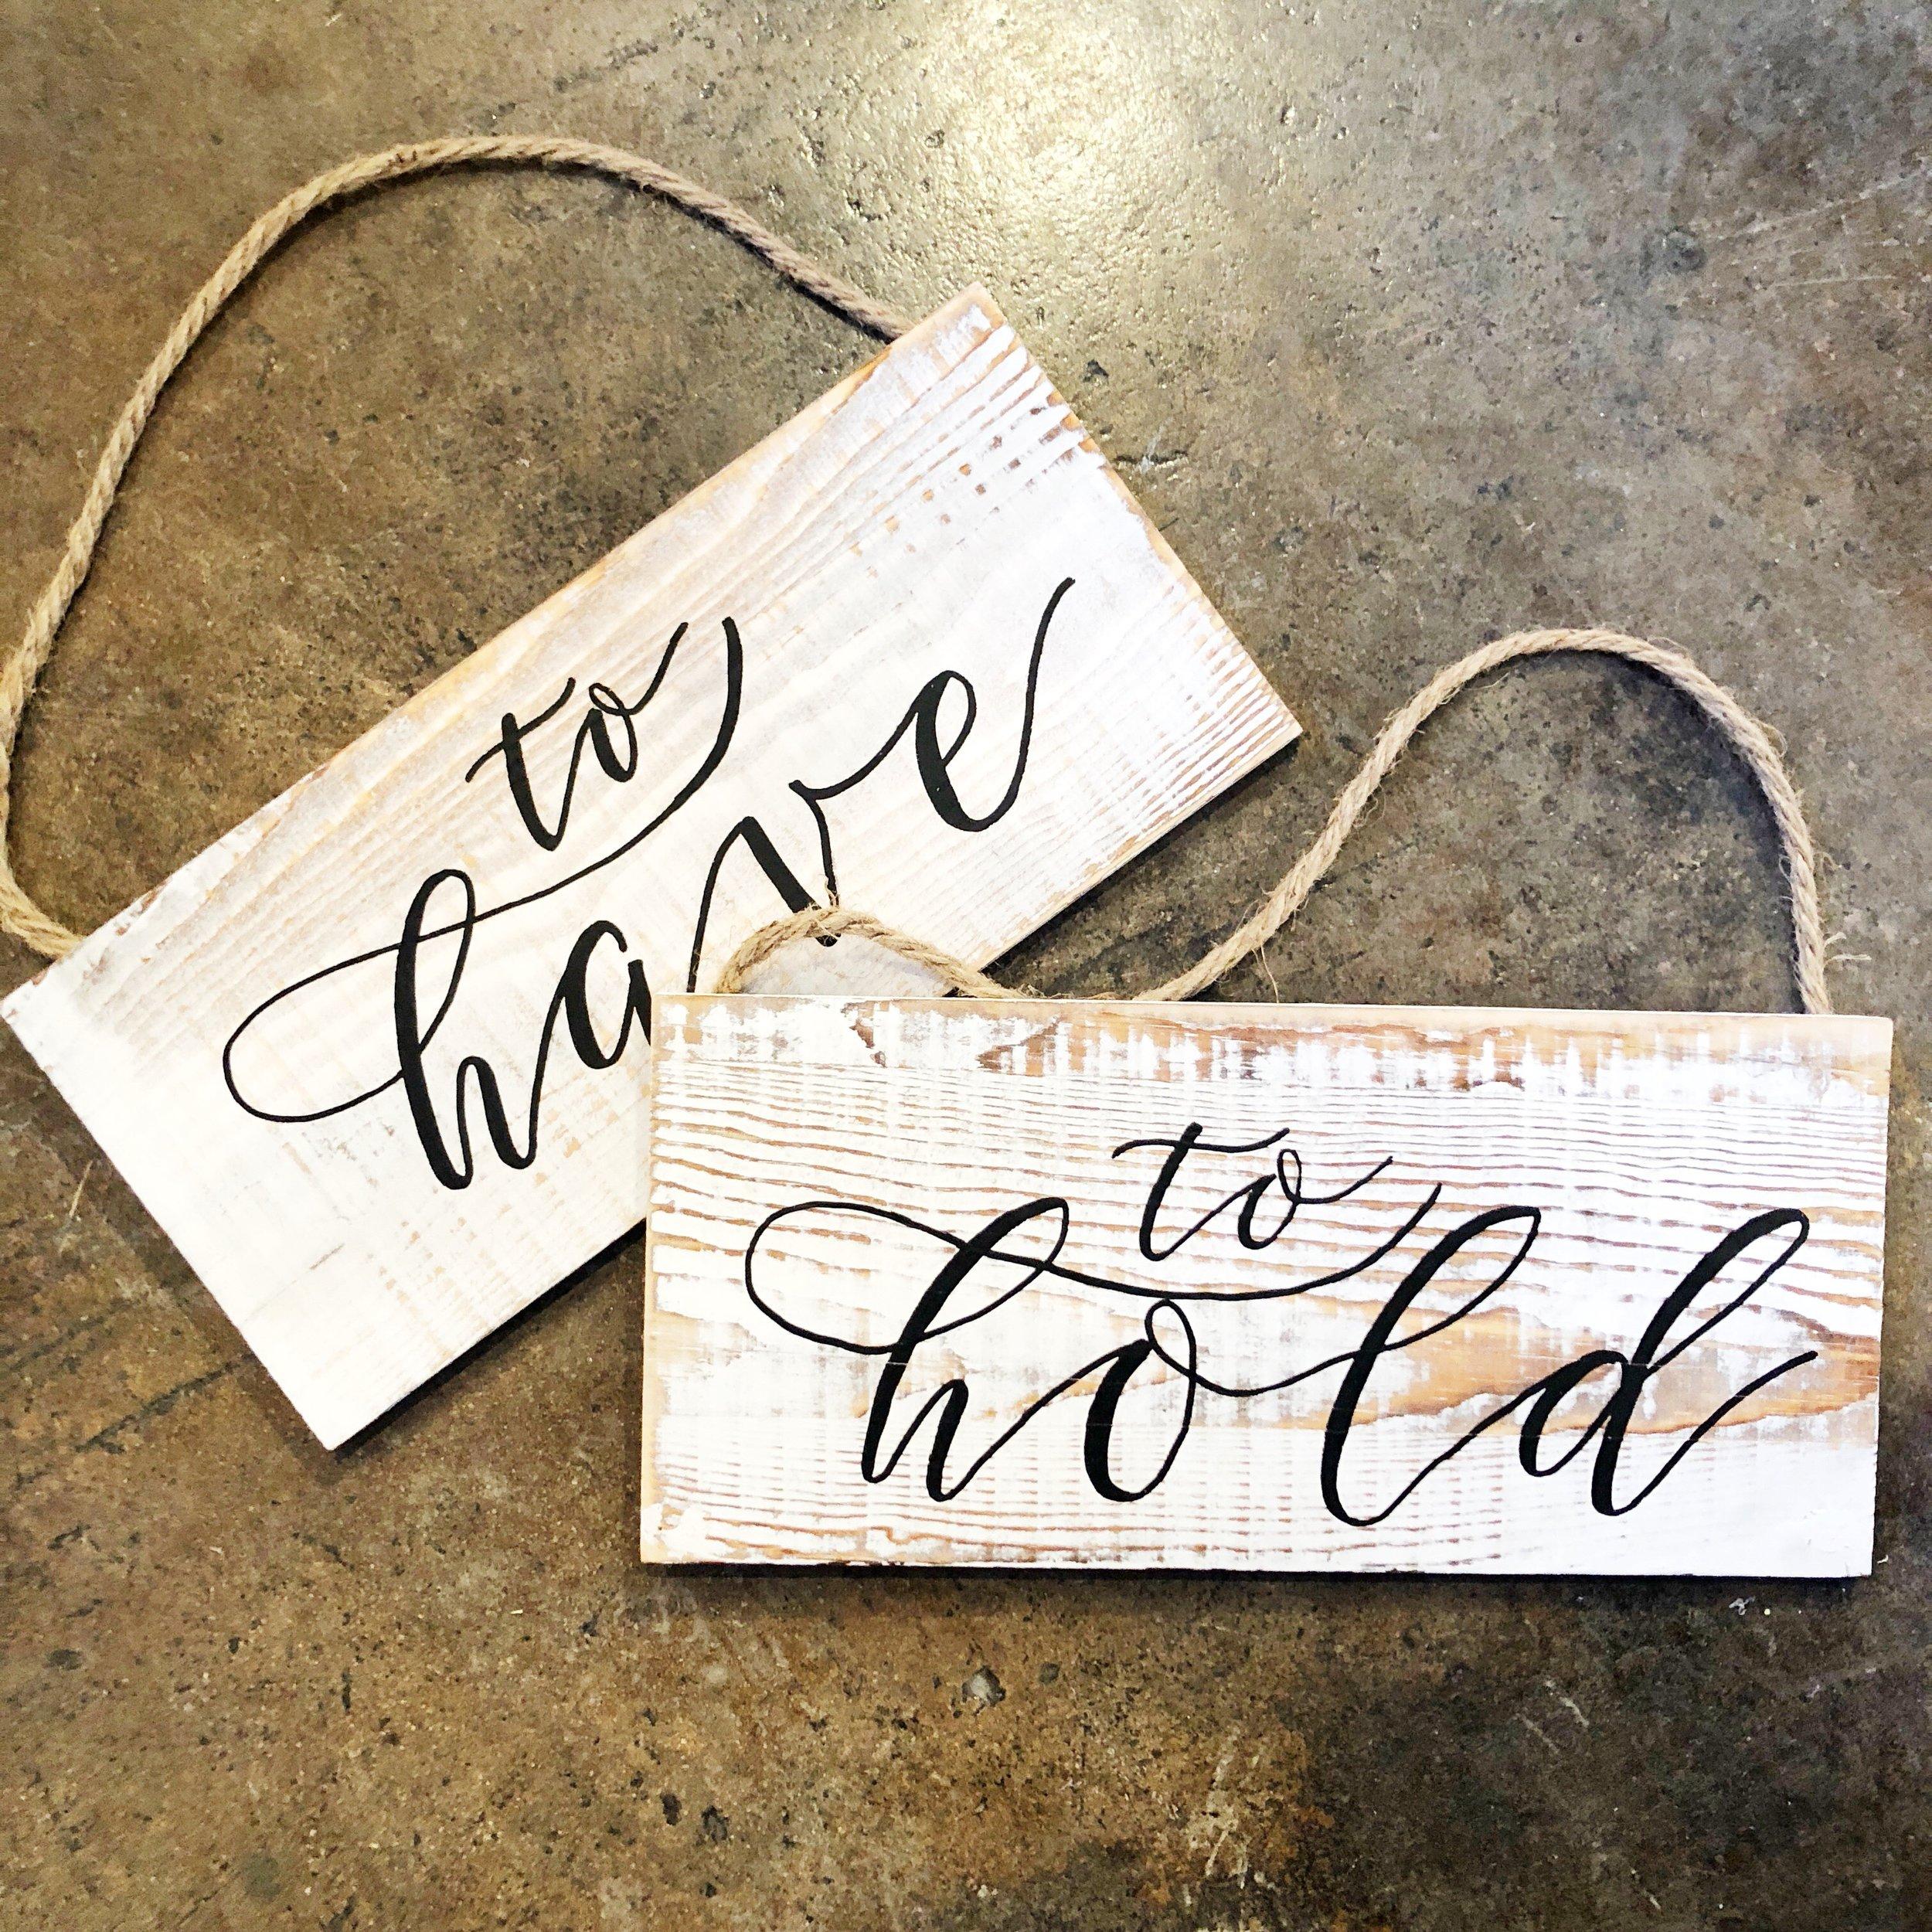 Central PA, York PA, JesSmith Designs, custom, wedding, invitations, bridal, Harrisburg, hanover, calligraphy, baltimore, wedding invitations, lancaster, gettysburg, 03-11 18.26.14.jpg